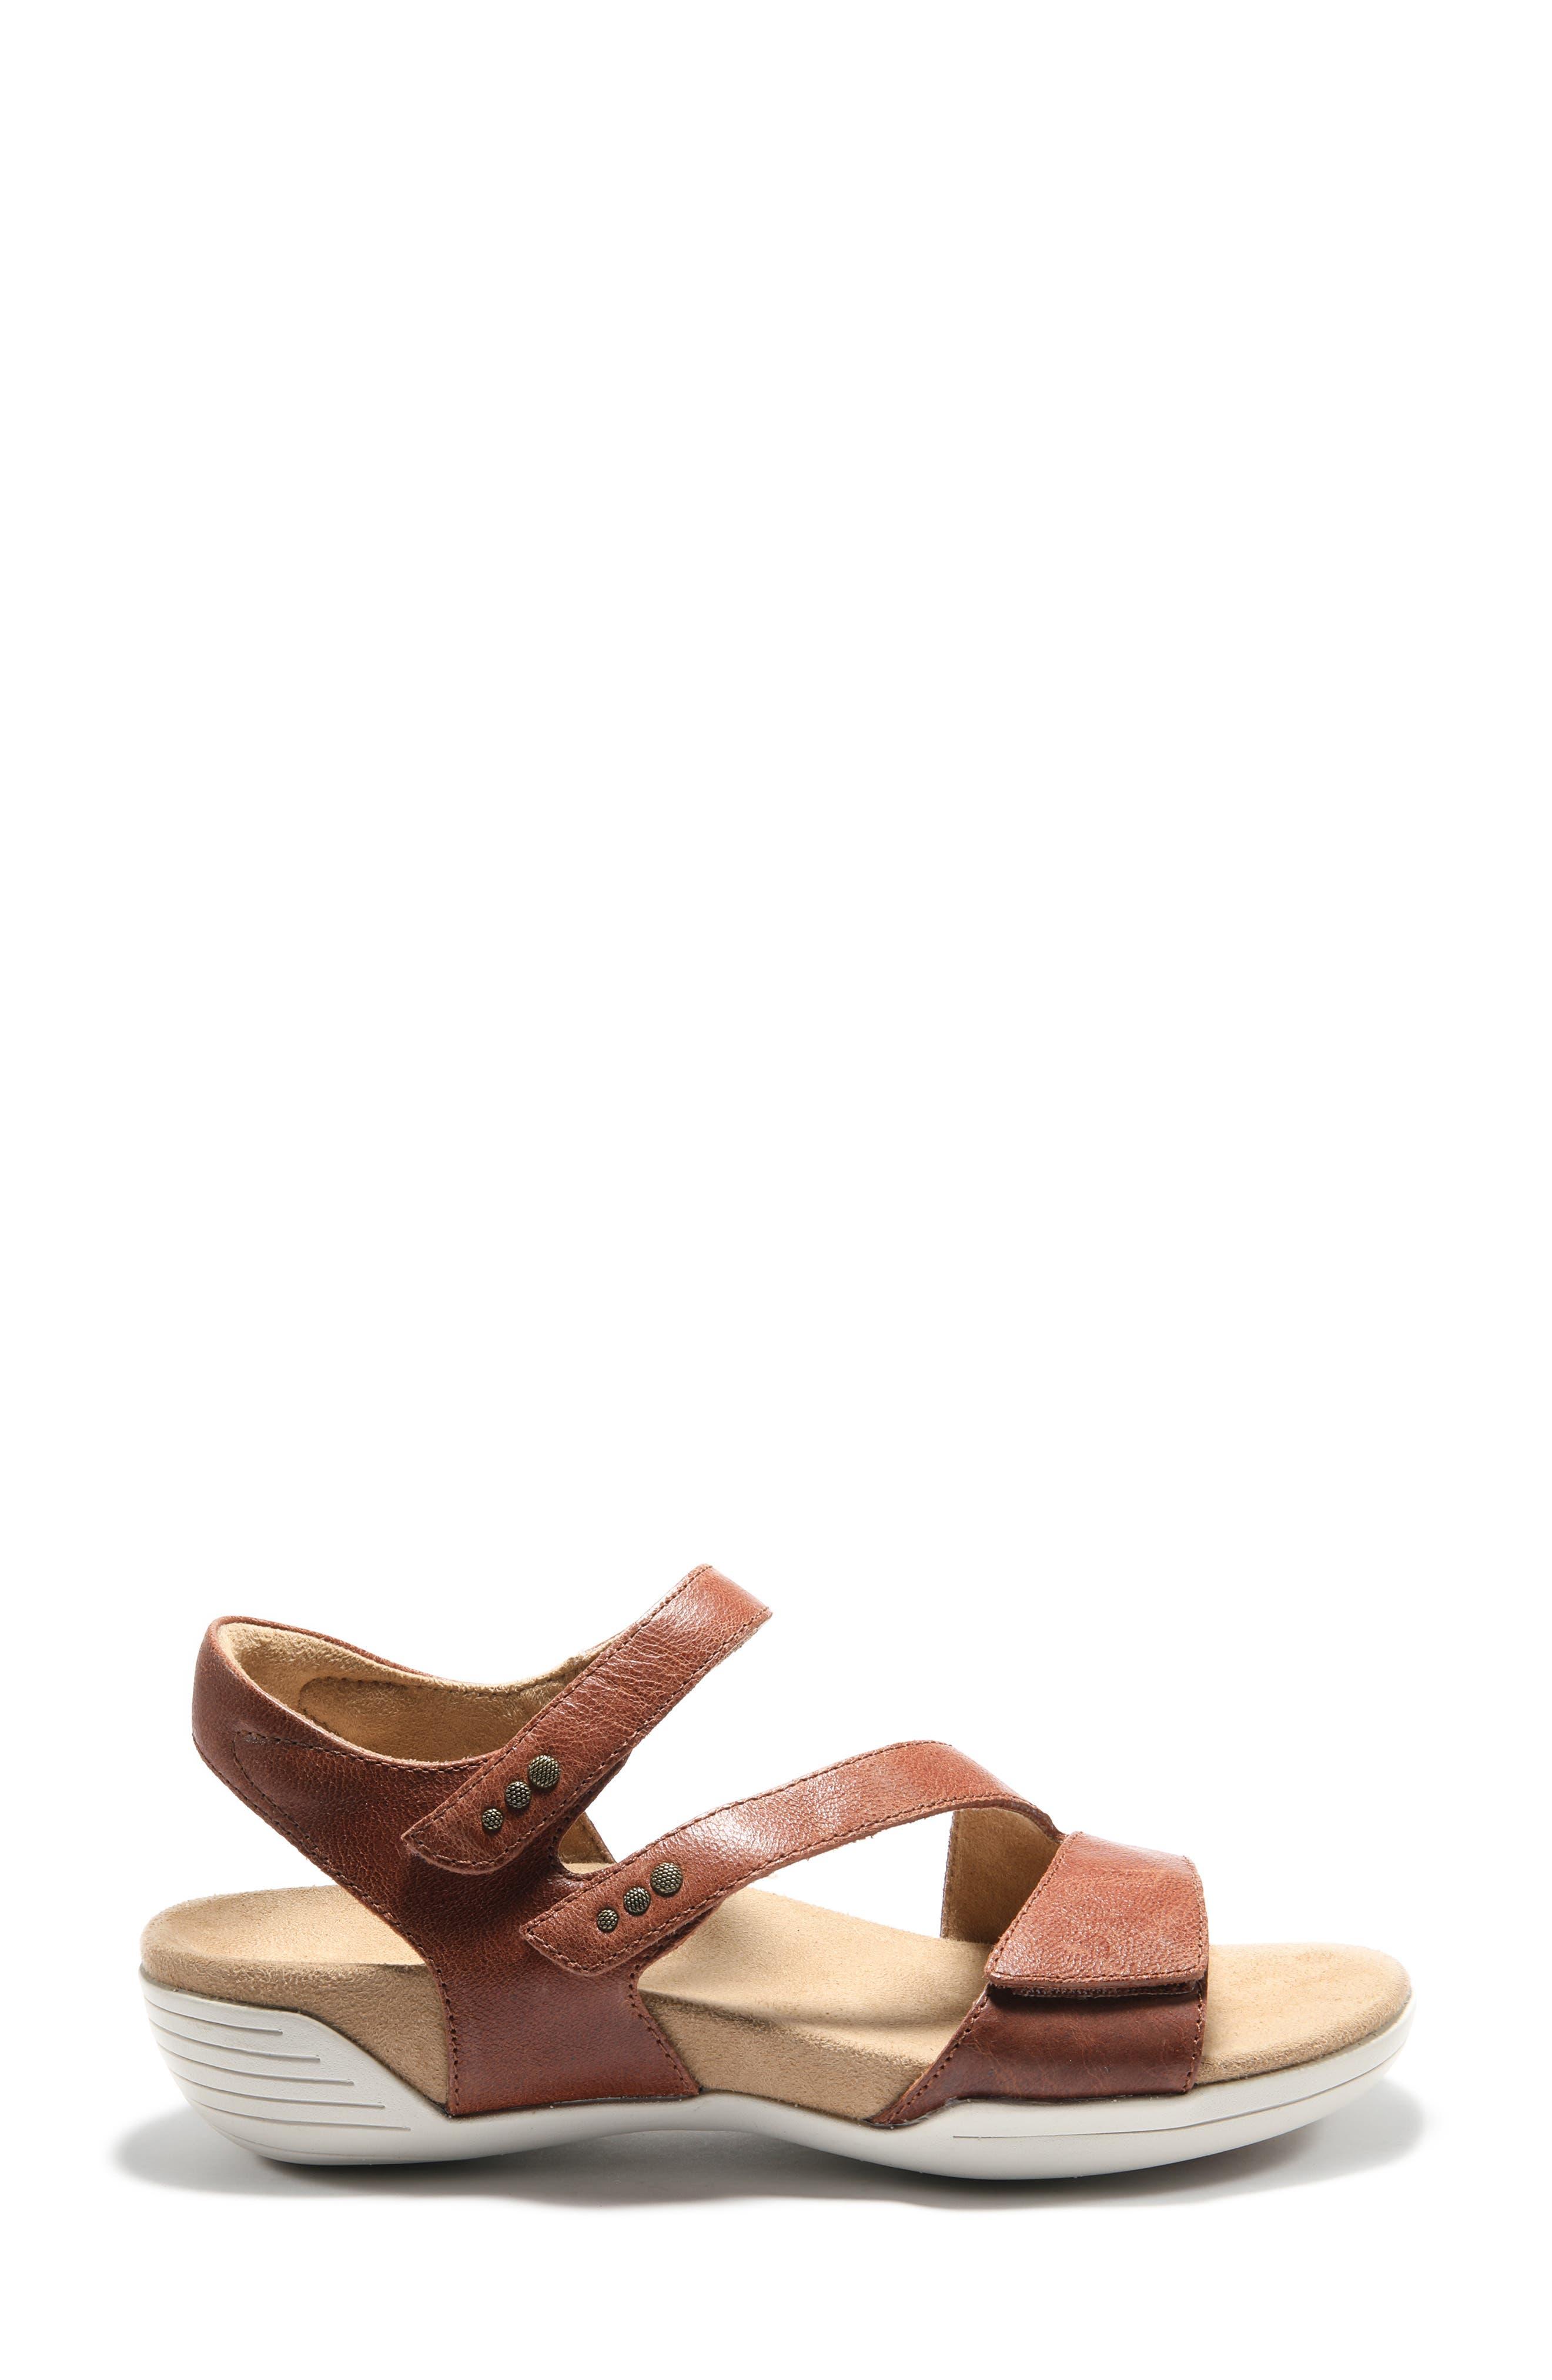 Women's Halsa Denia Ankle Strap Sandal